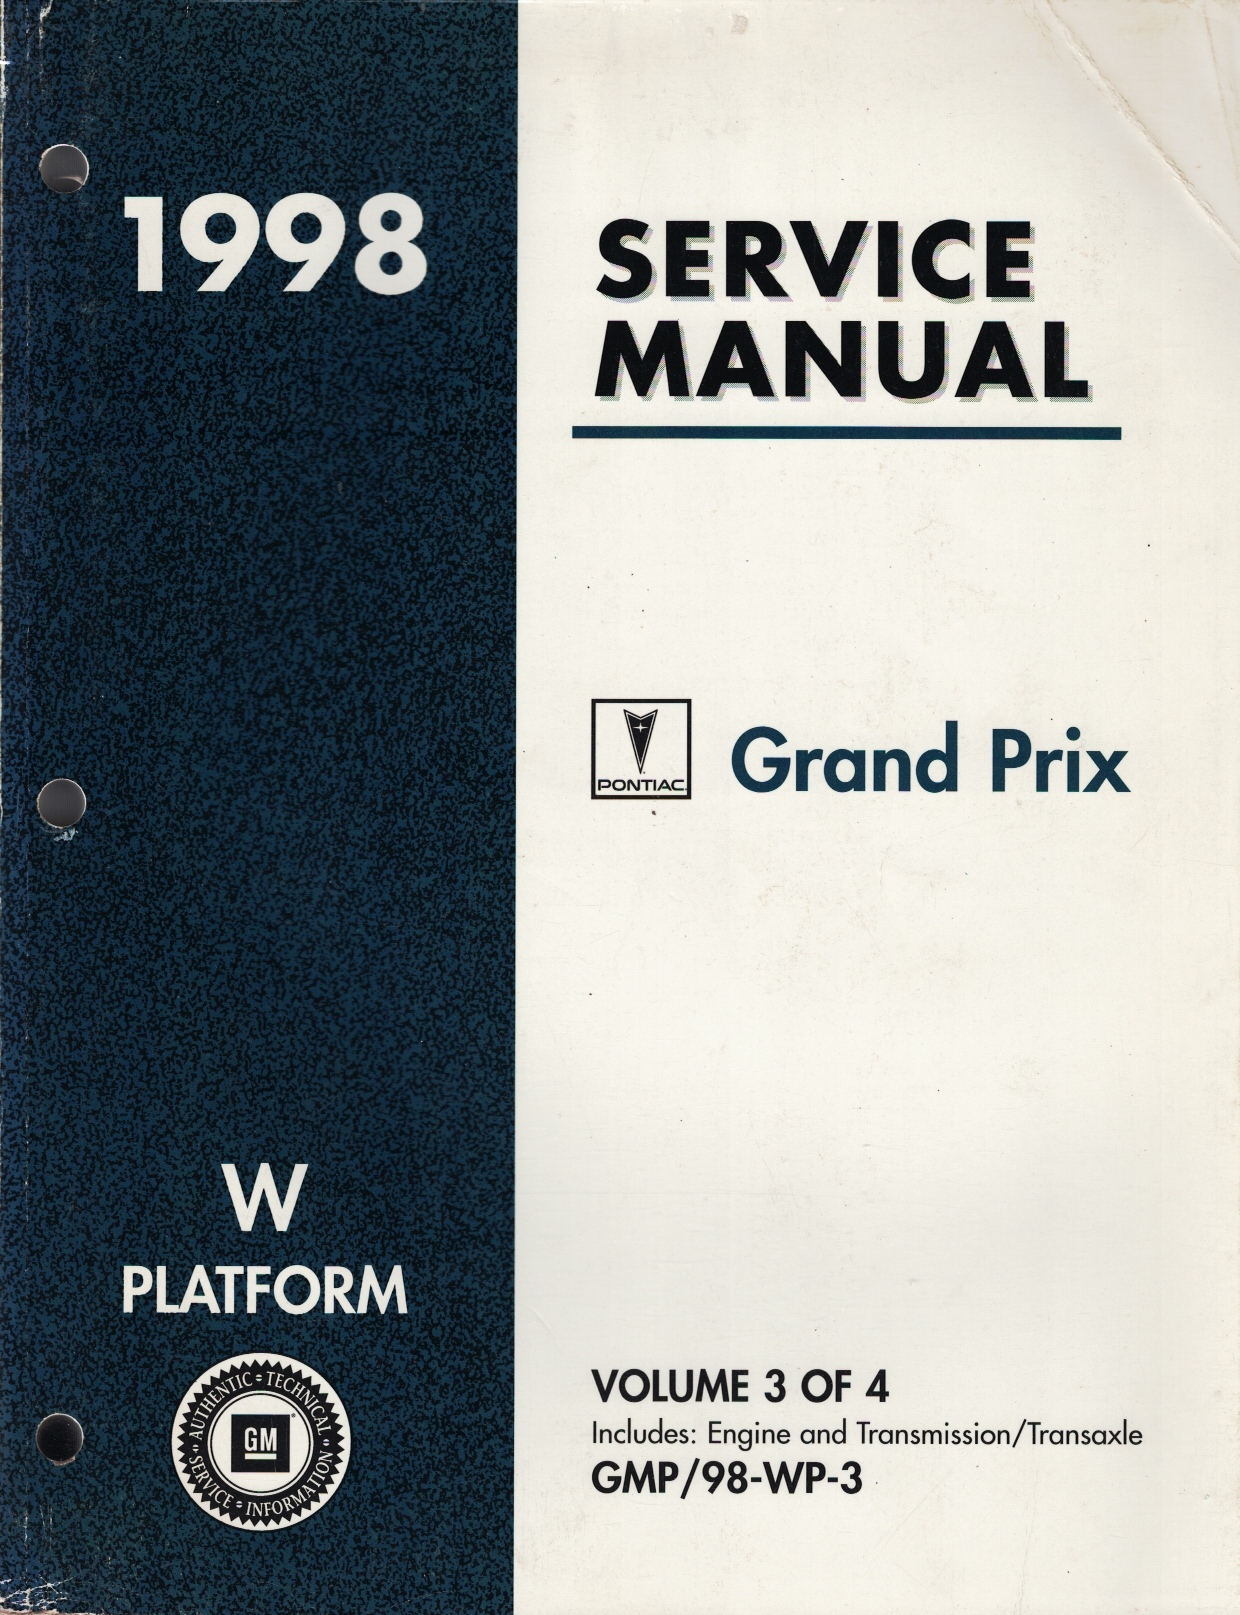 Image for 1998 W Platform - Pontiac Grand Prix Service Manual (Volume 3 Only) [Covers: Engine]